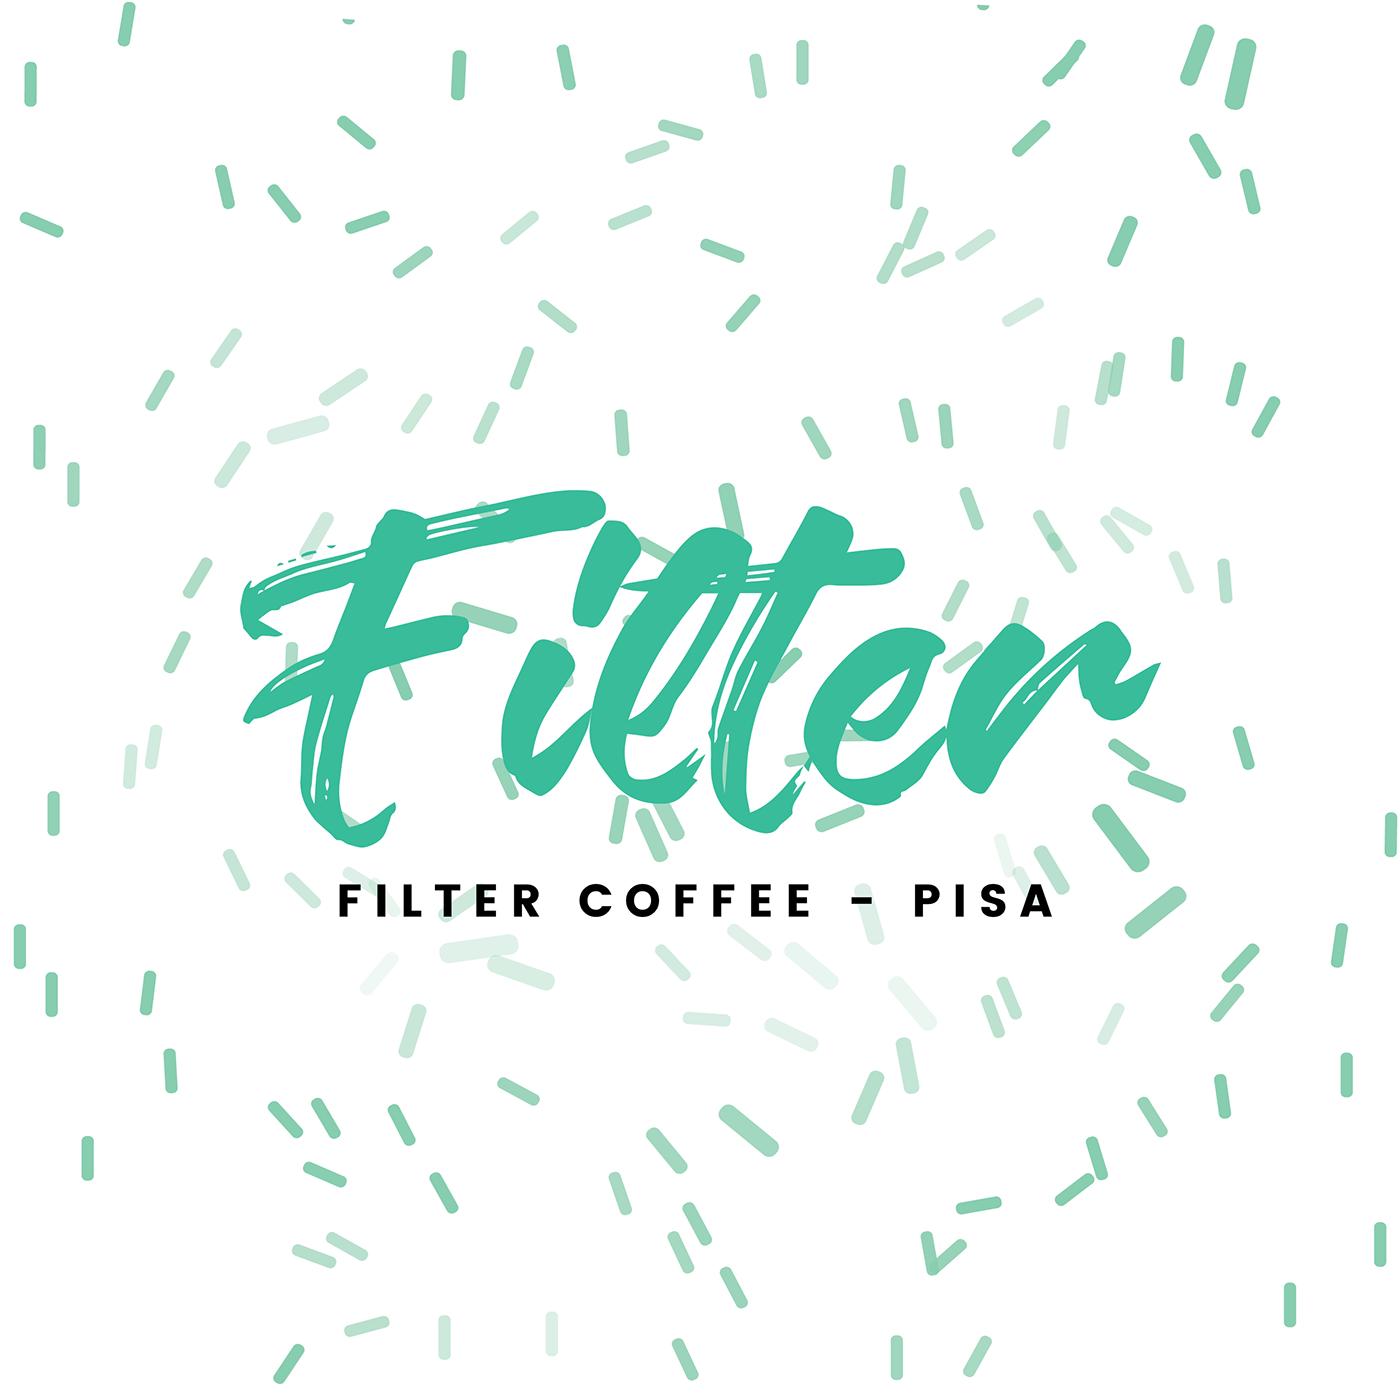 coffee mockup,bag mockup,coffee mug,handlettering package,business card mockup,bar branding,coffee branding,glass mockup